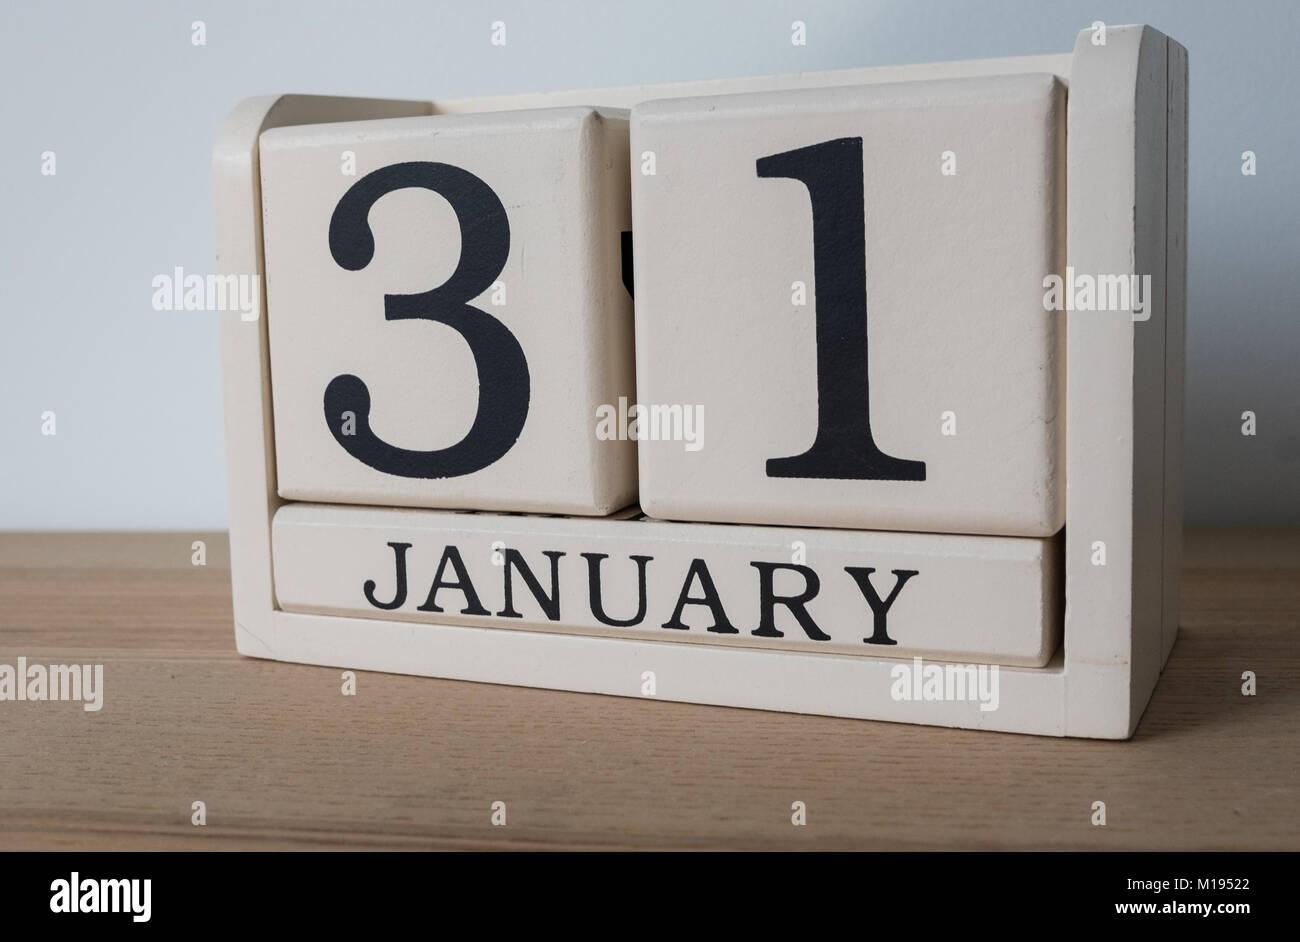 31st January, date on calendar. Self assessment tax deadline for self employed in the UK - Stock Image